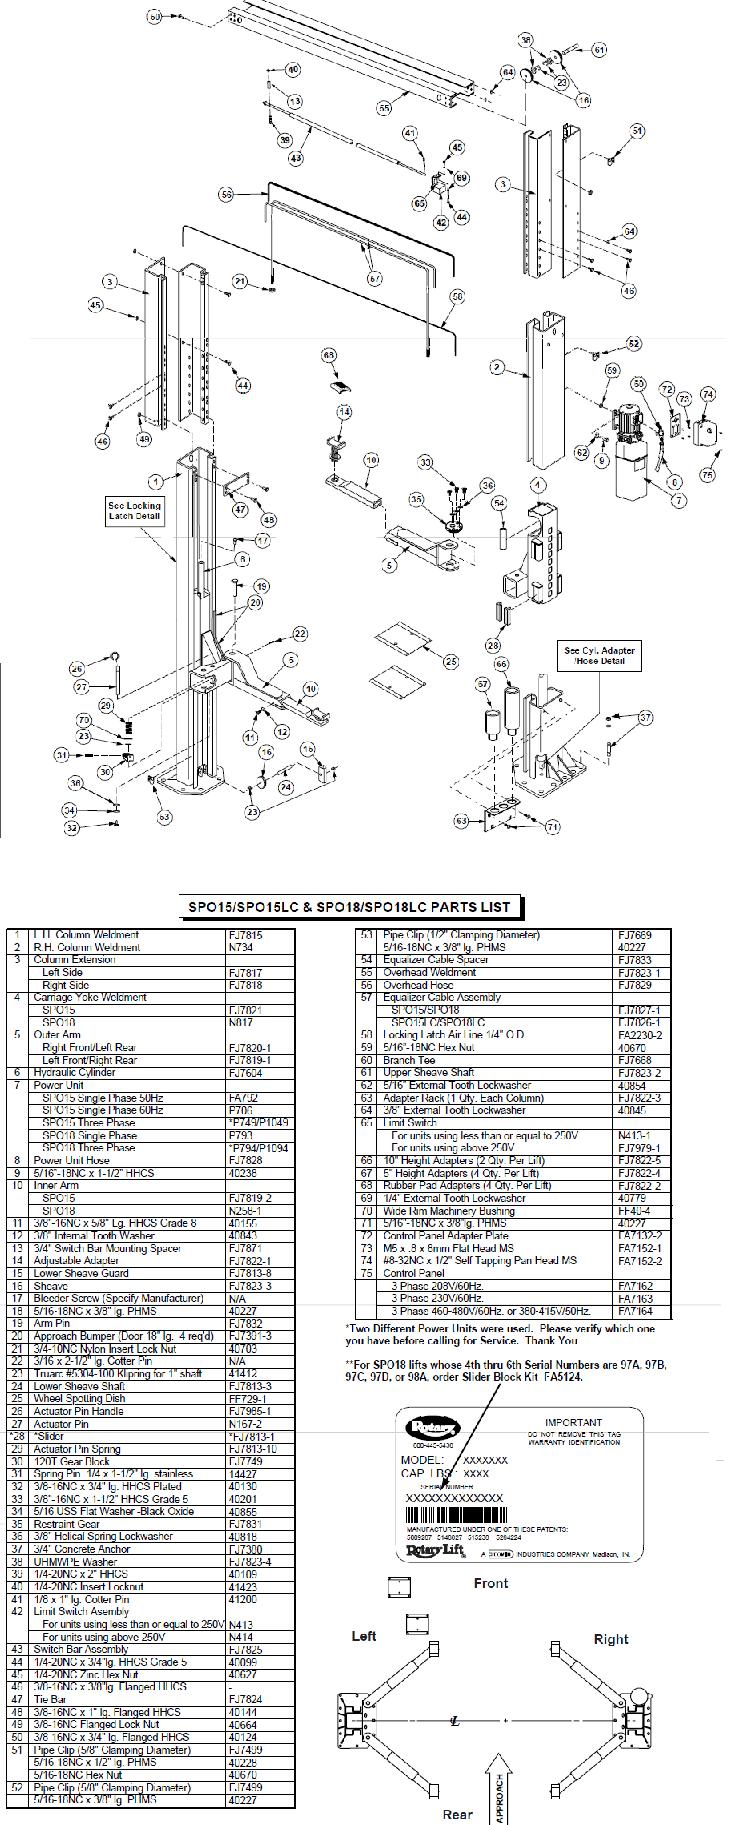 Rotary SPO18LC Parts Diagram